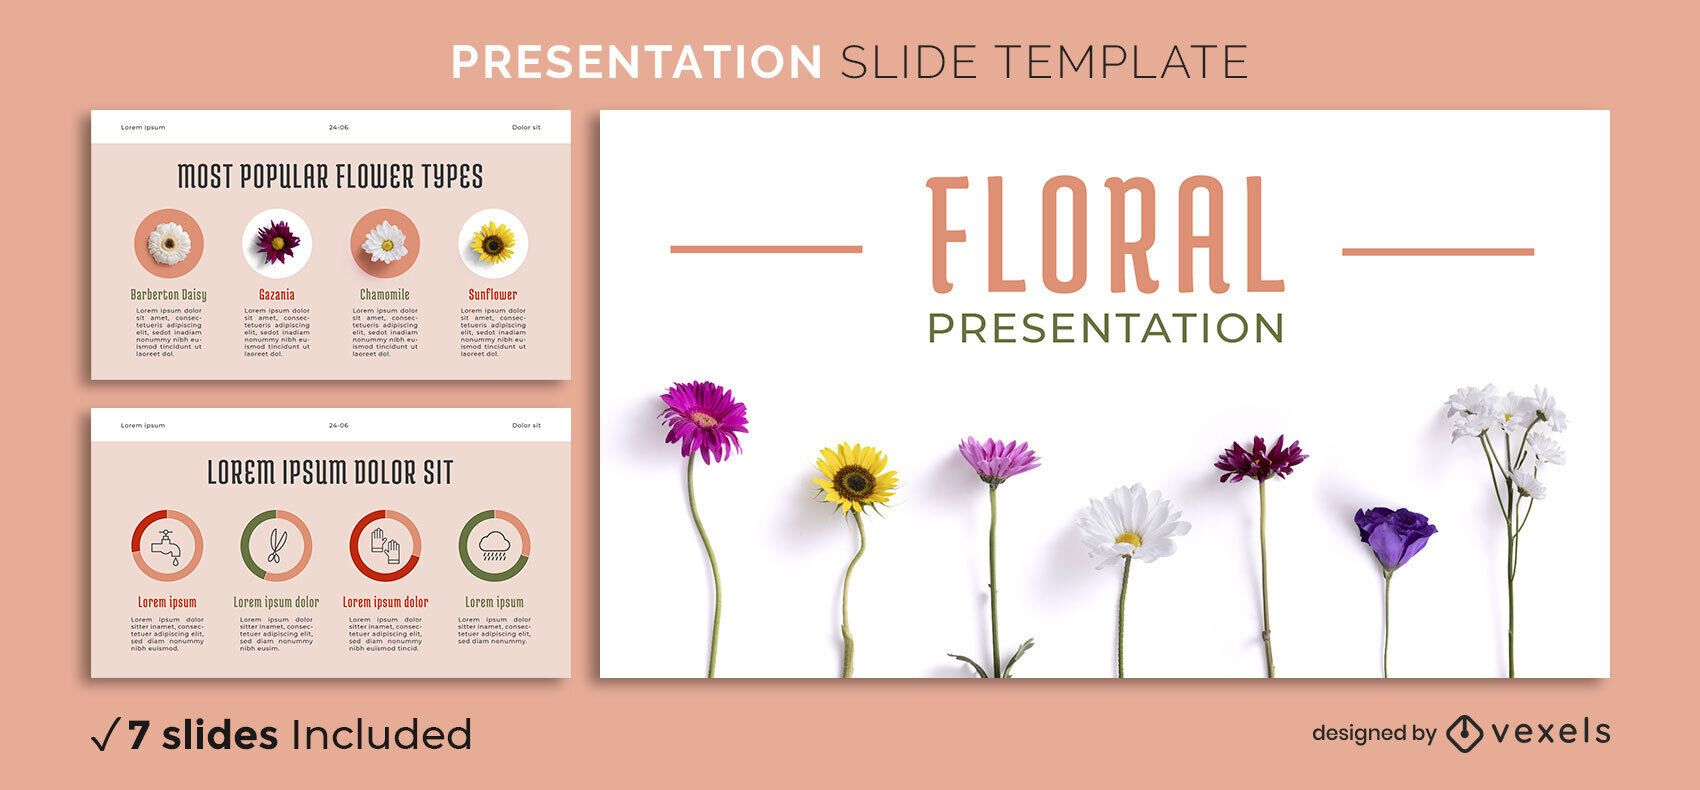 Simple Floral Presentation Template